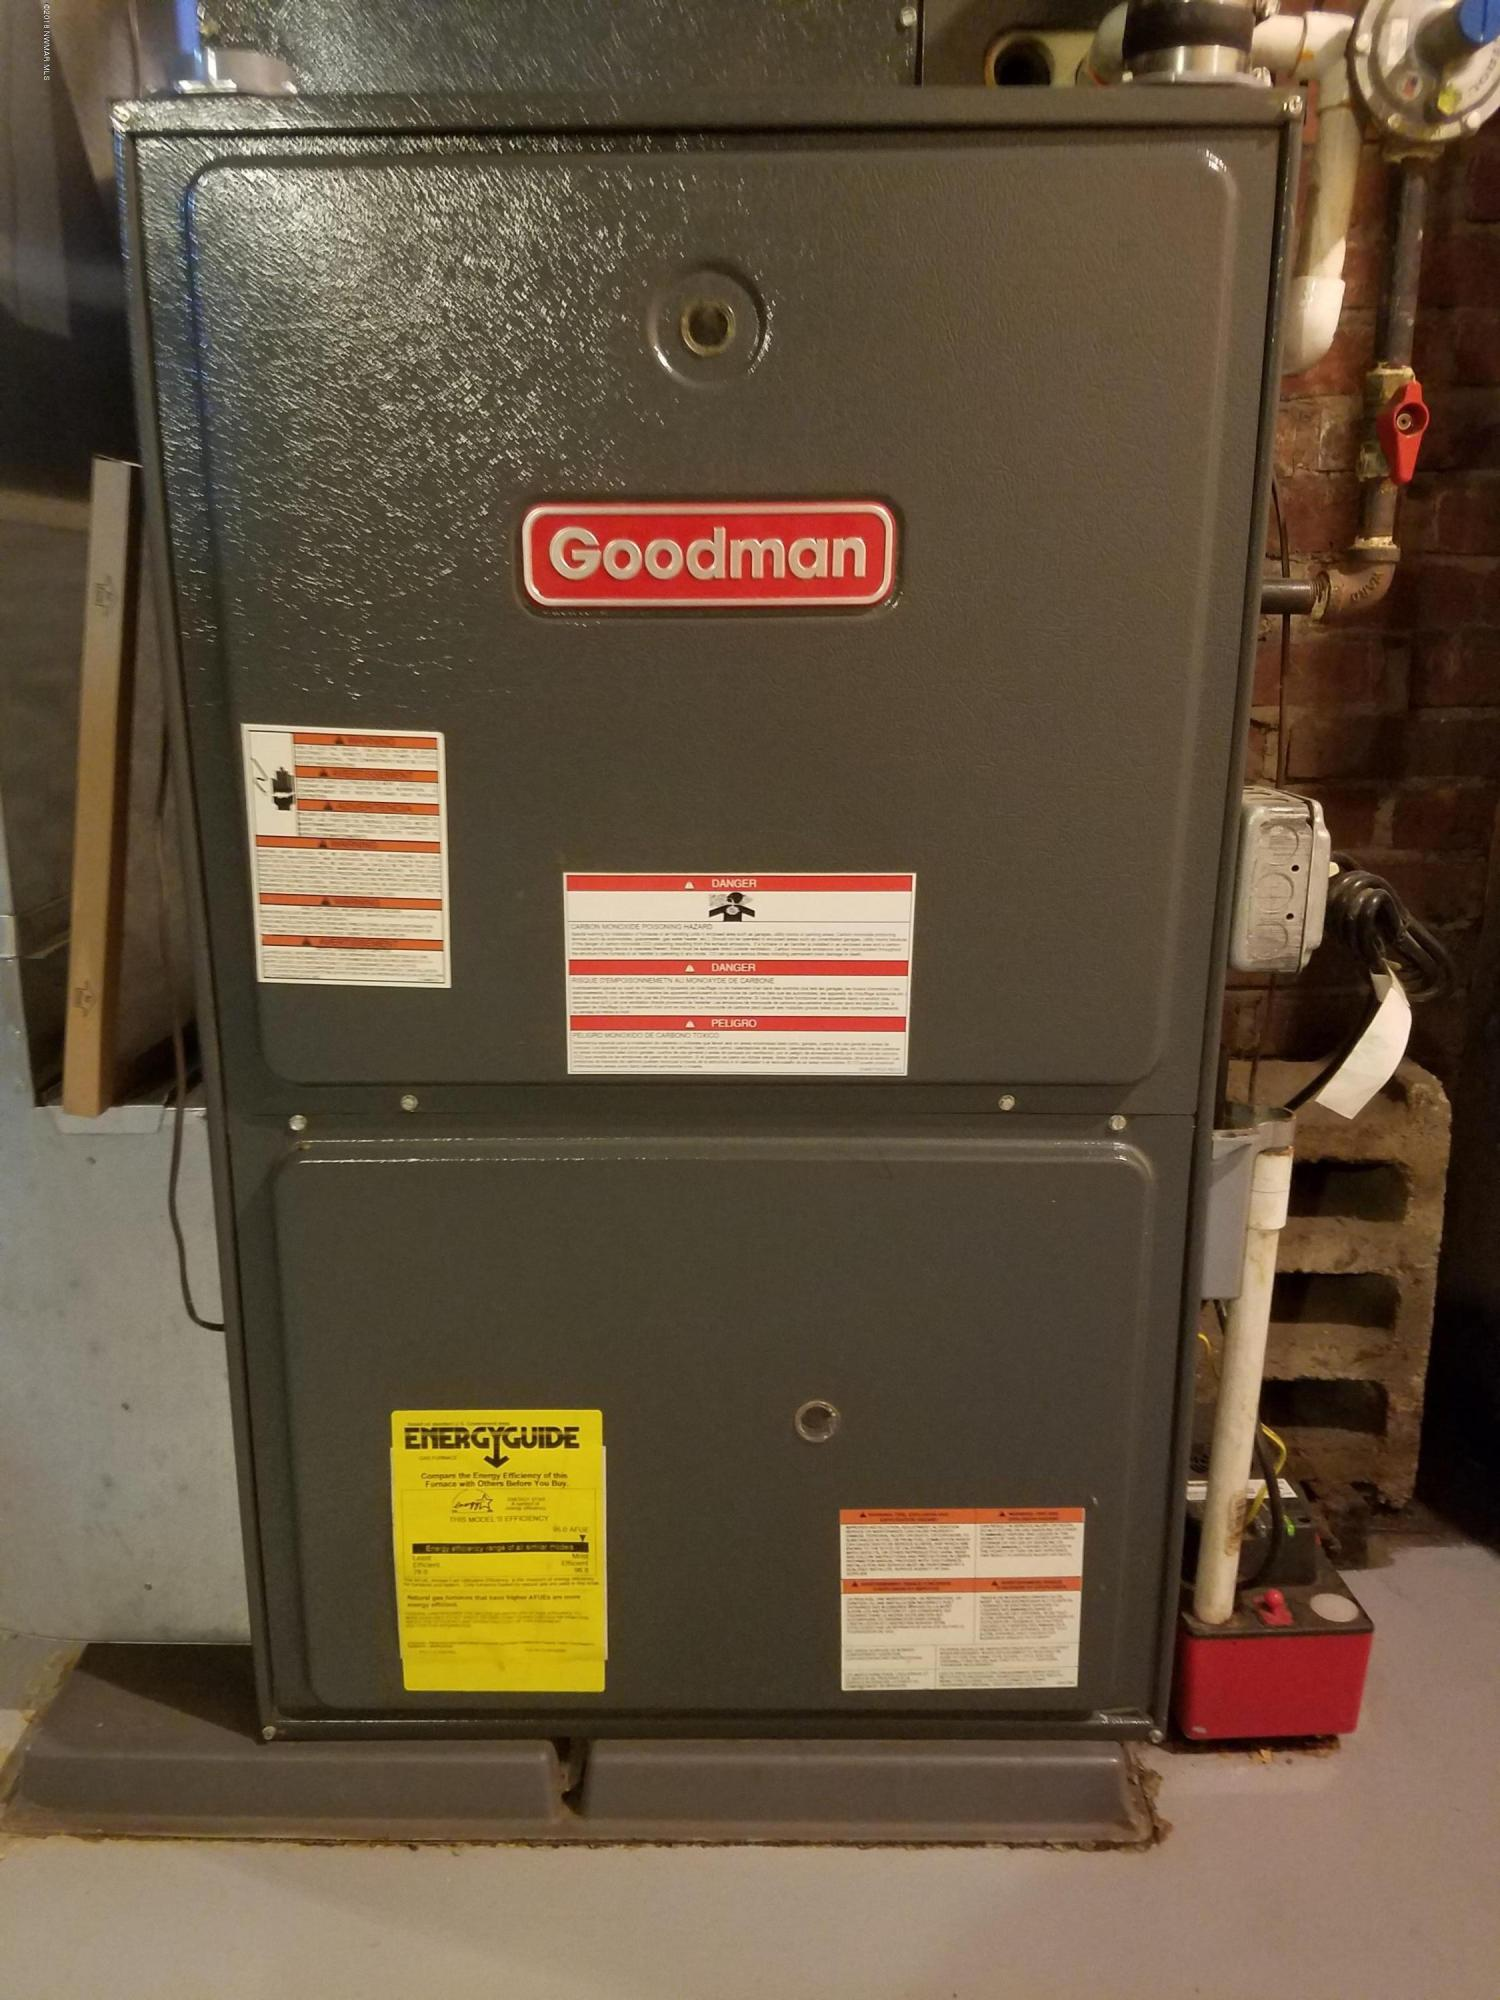 Goodman High-Efficiency Gas Forced-Air Furnace